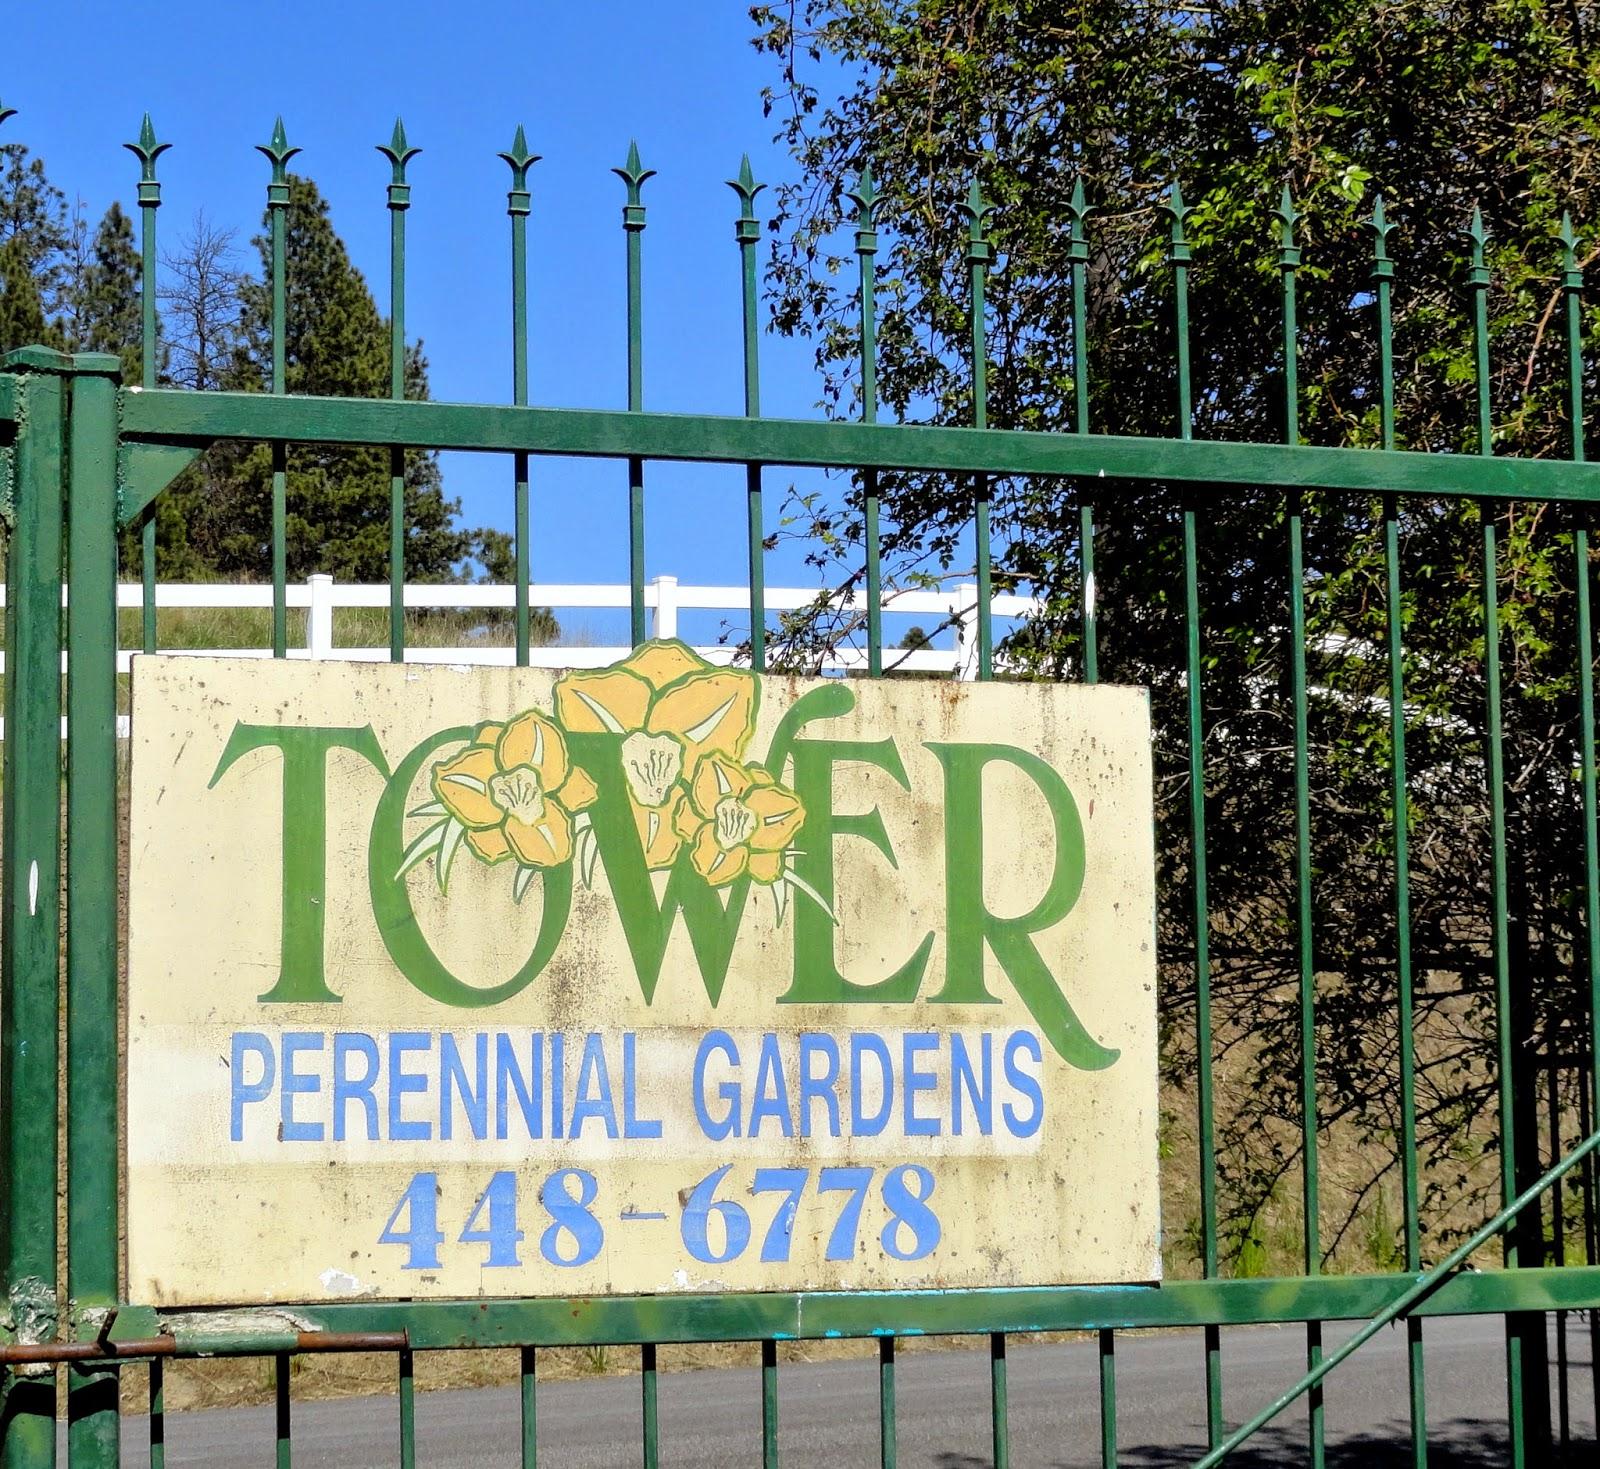 Tower Perennial Gardens: Danger Garden: One More Spokane Nursery Visit: Tower